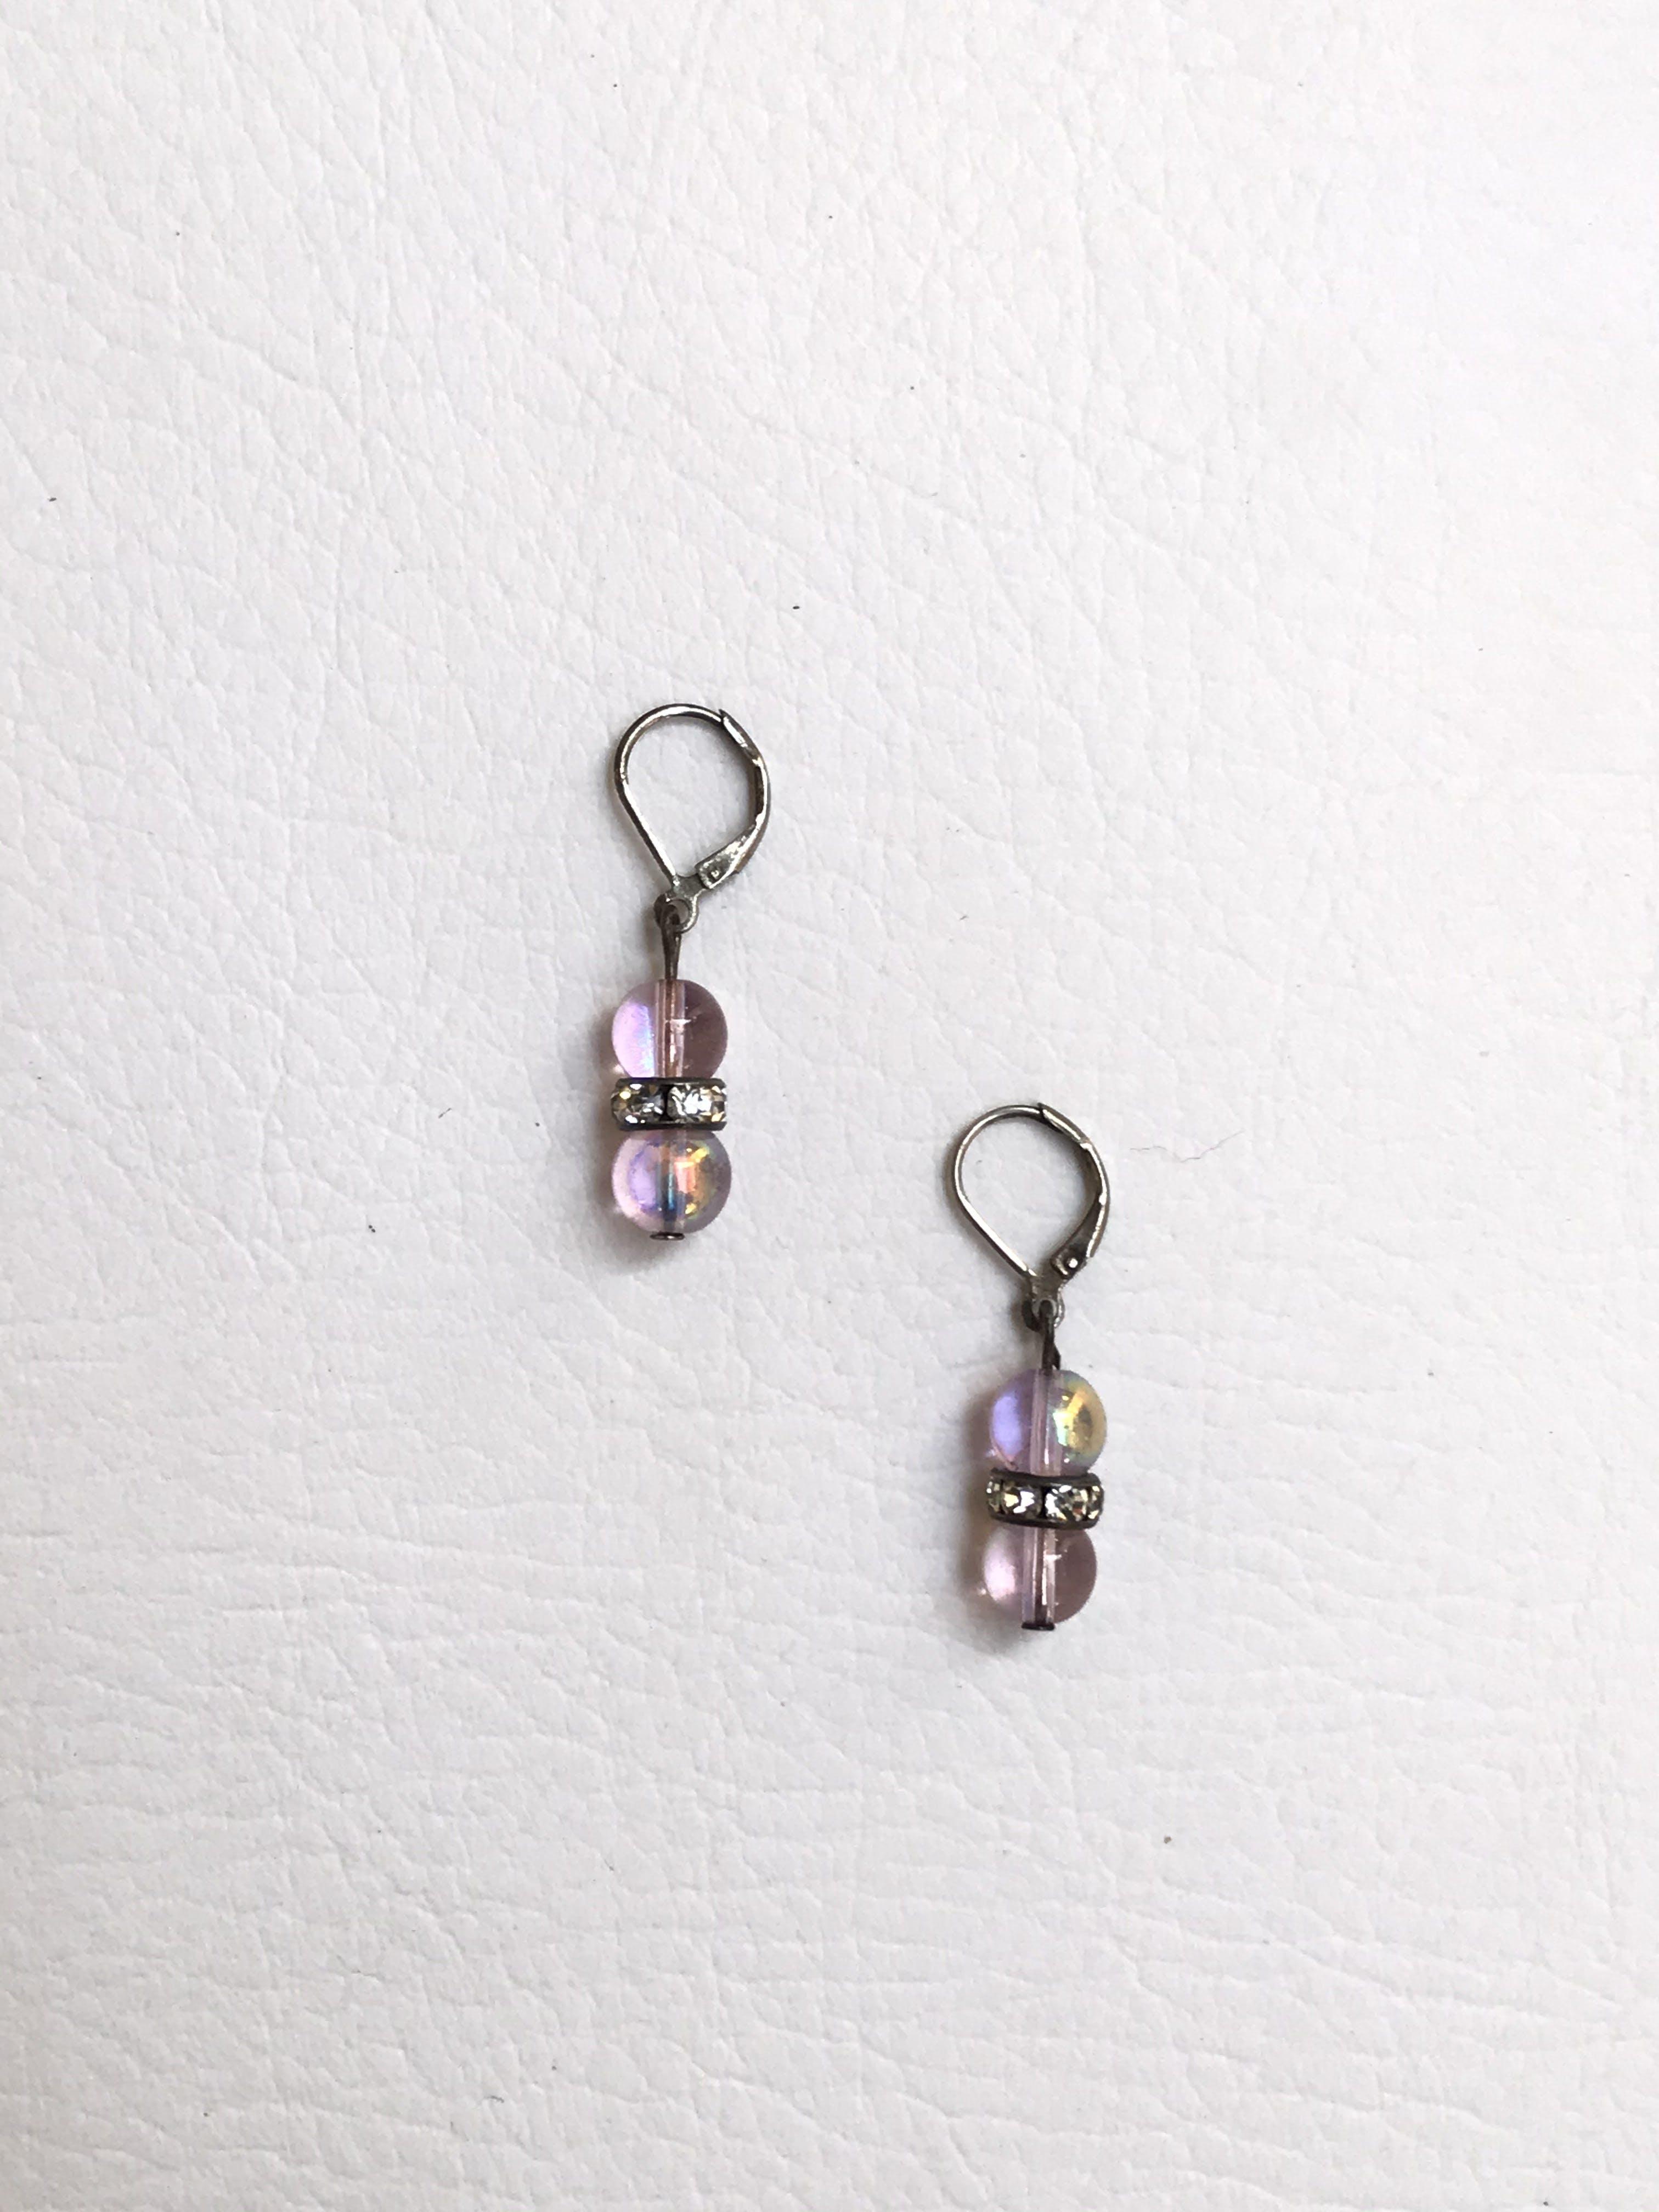 Arteres de dos bolitas acrílicas rosa con aro central con aplicaciones tipo diamante. Largo 3cm